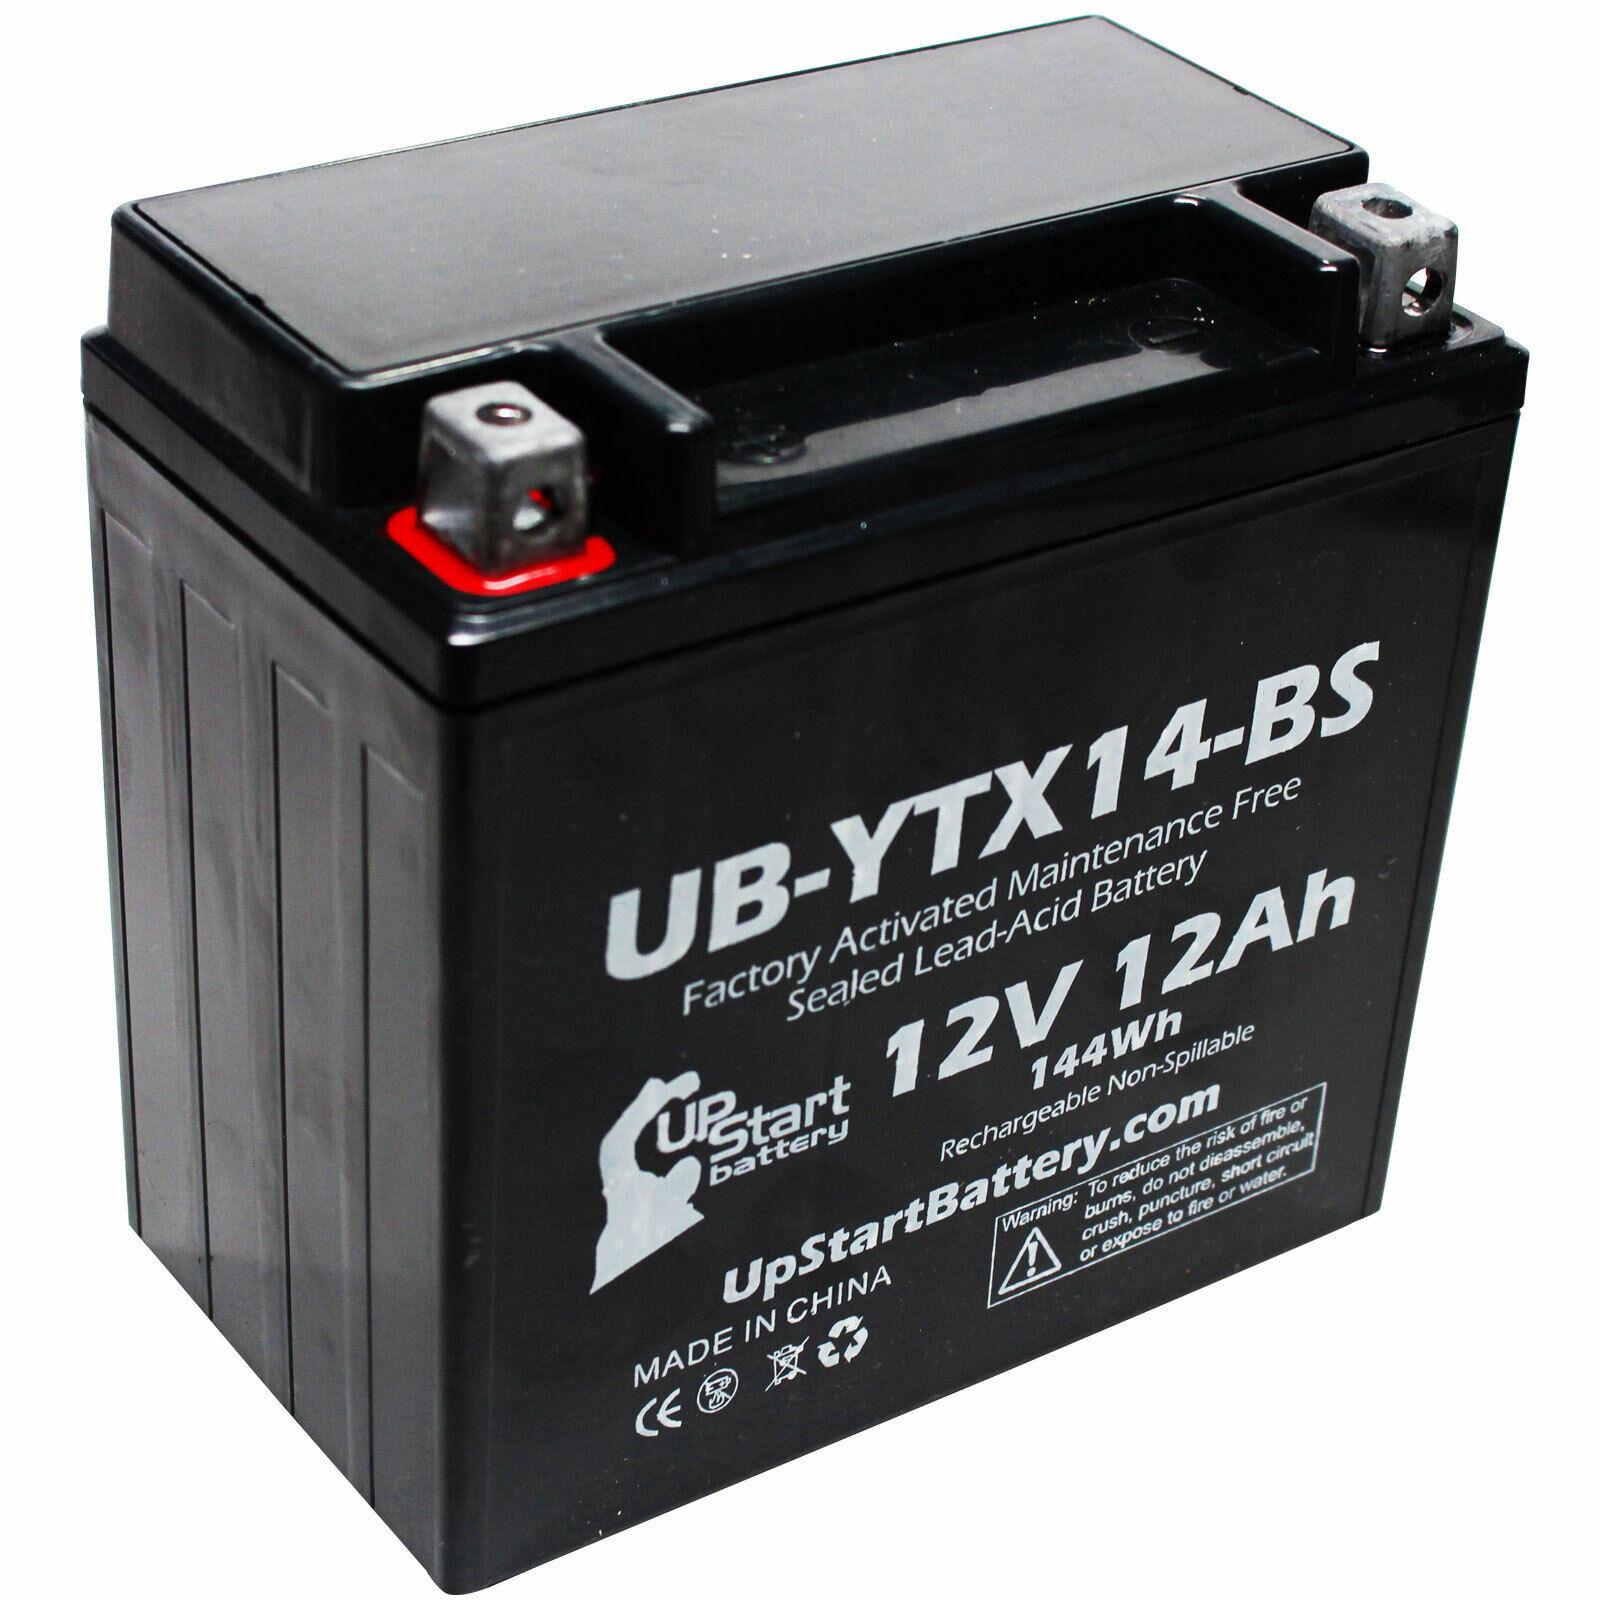 12V 12AH Battery for 2004 Honda TRX450 FourTrax Foreman S, ES 450 CC